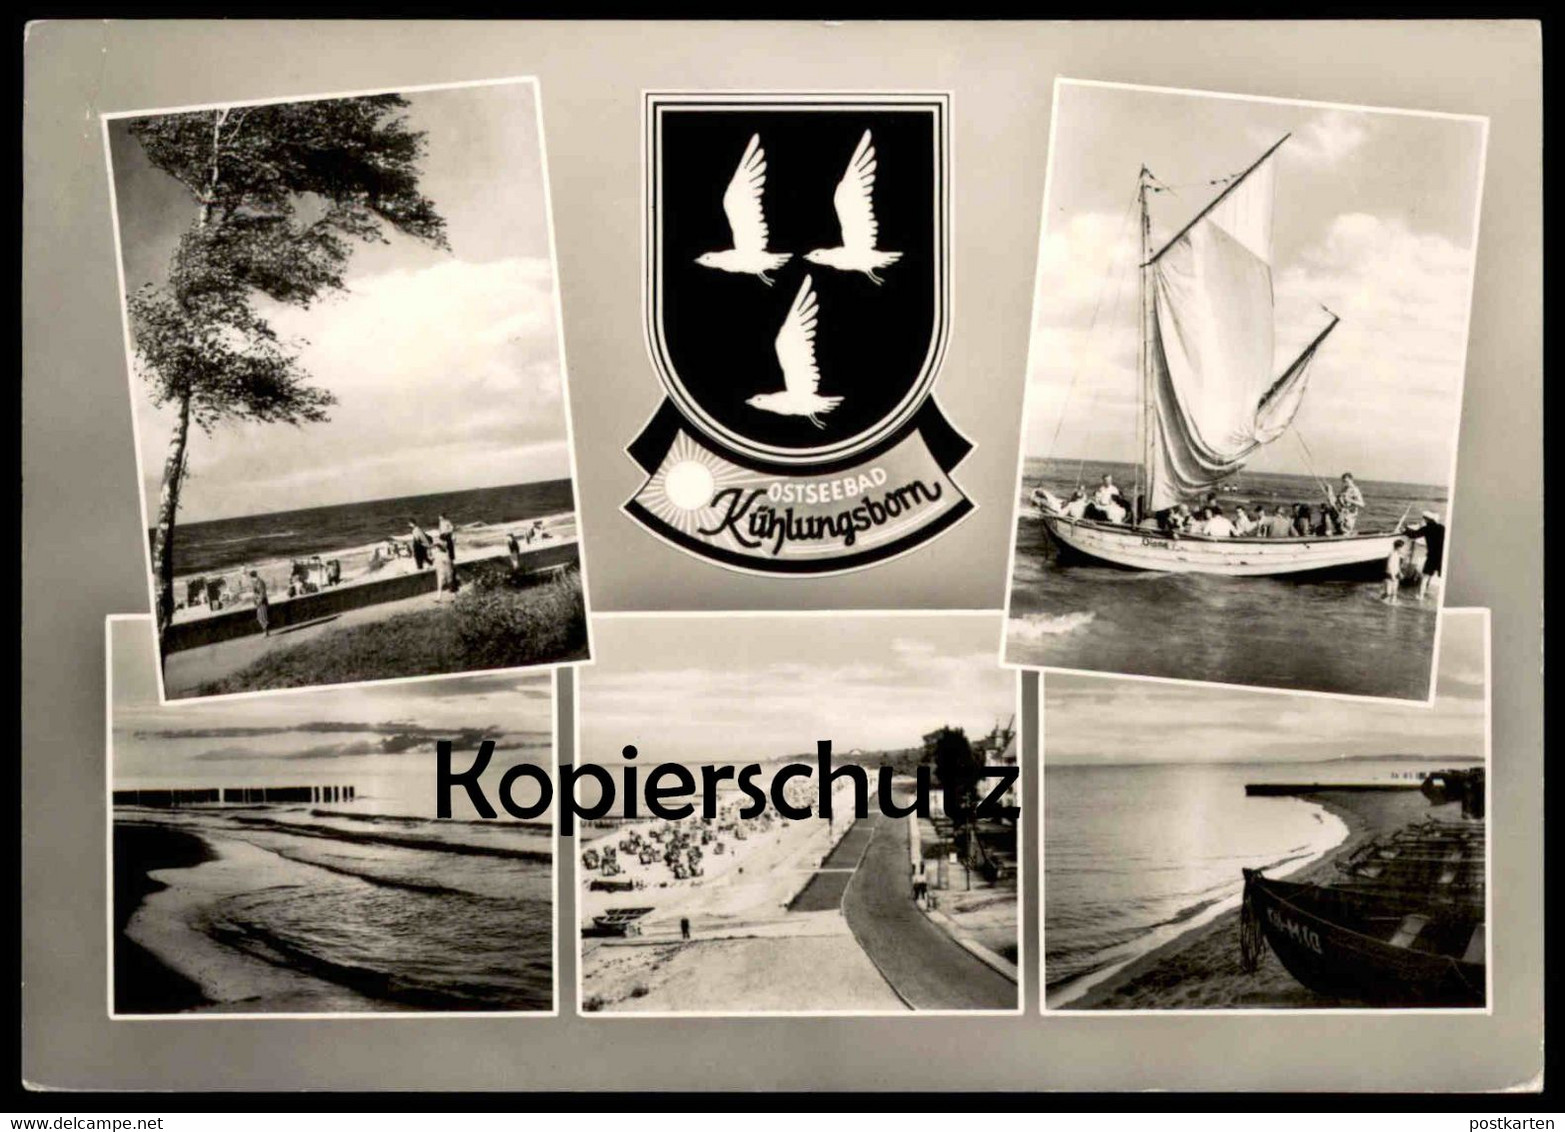 ÄLTERE POSTKARTE KÜHLUNGSBORN Wappen Blason Möwe Segelschiff sailing boat Diana bateau à voiles gull mouette postcard AK